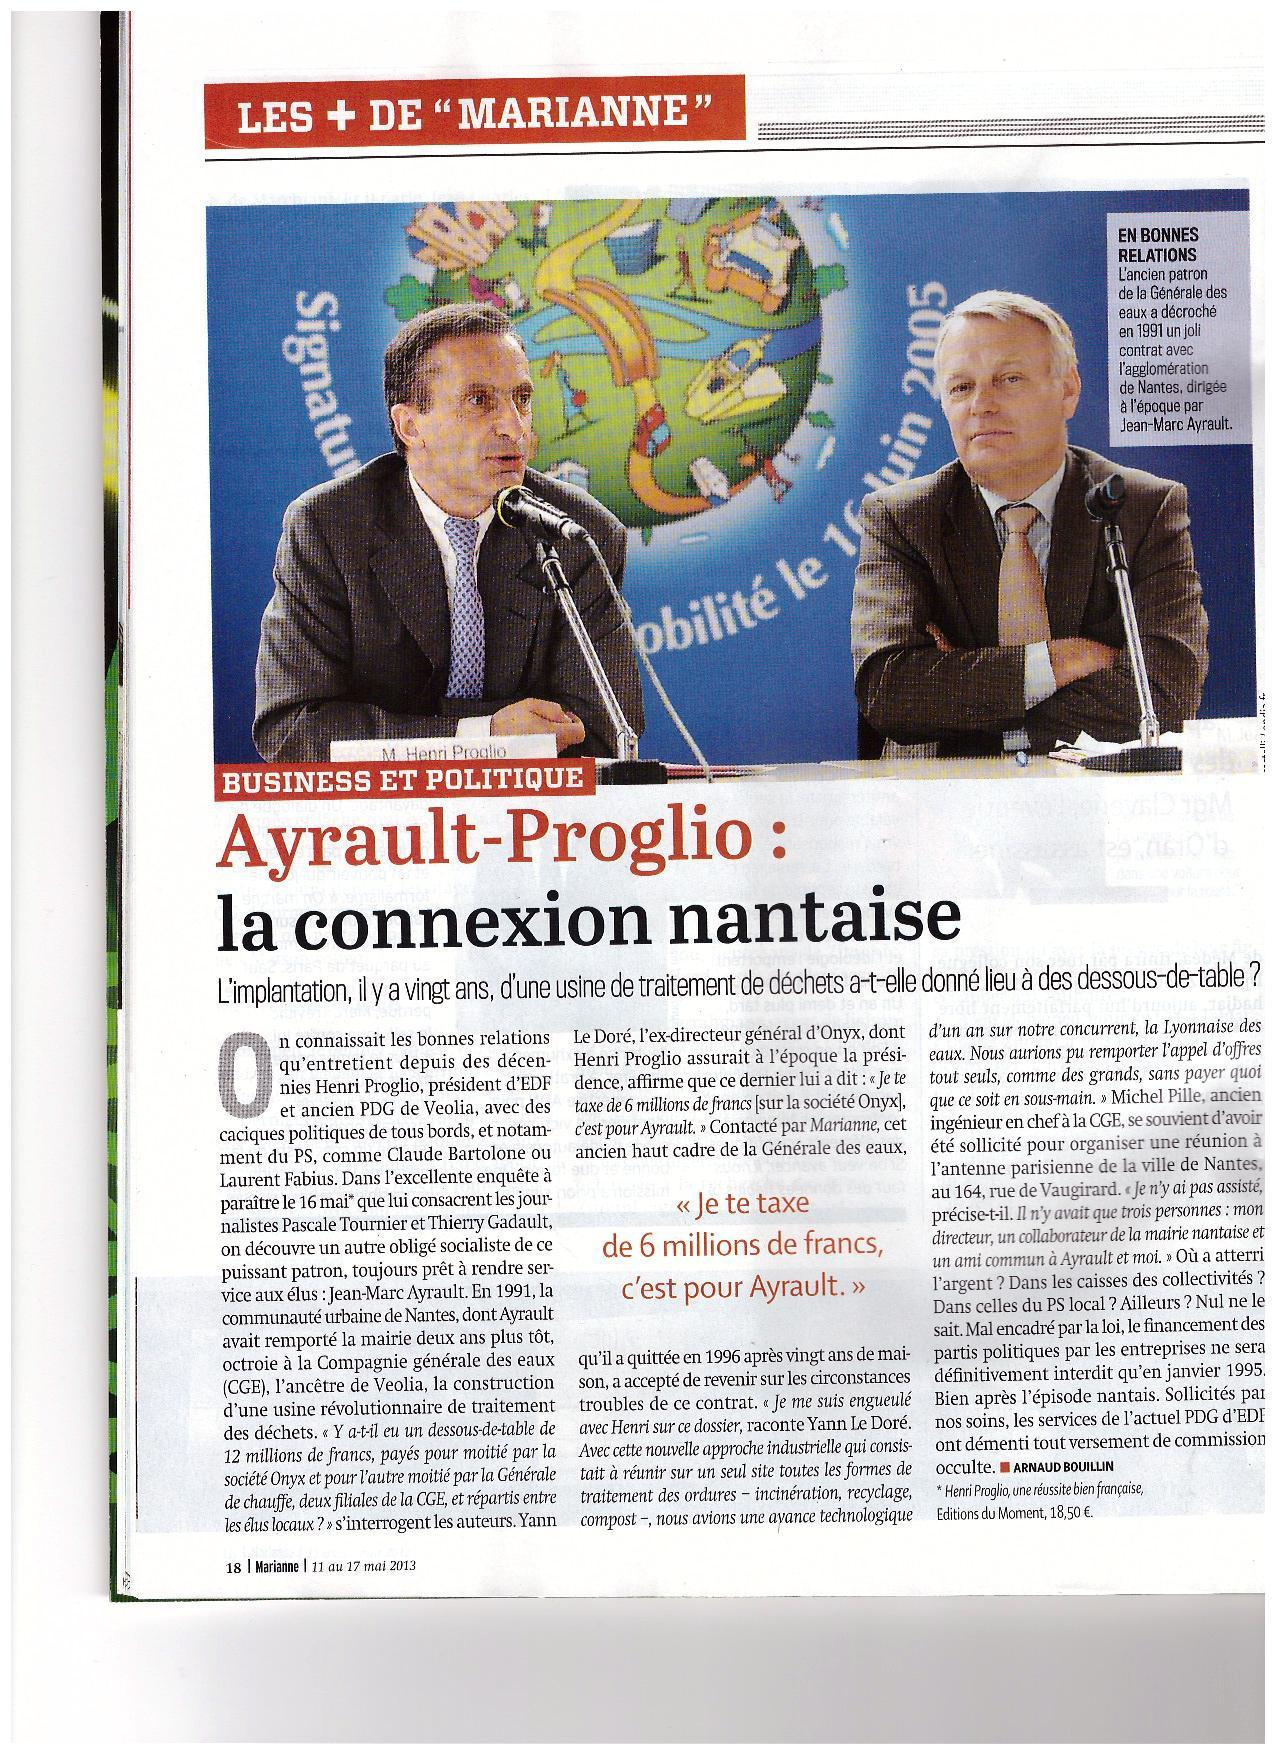 article de Marianne : Ayrault, Proglio: La connexion nantaise.